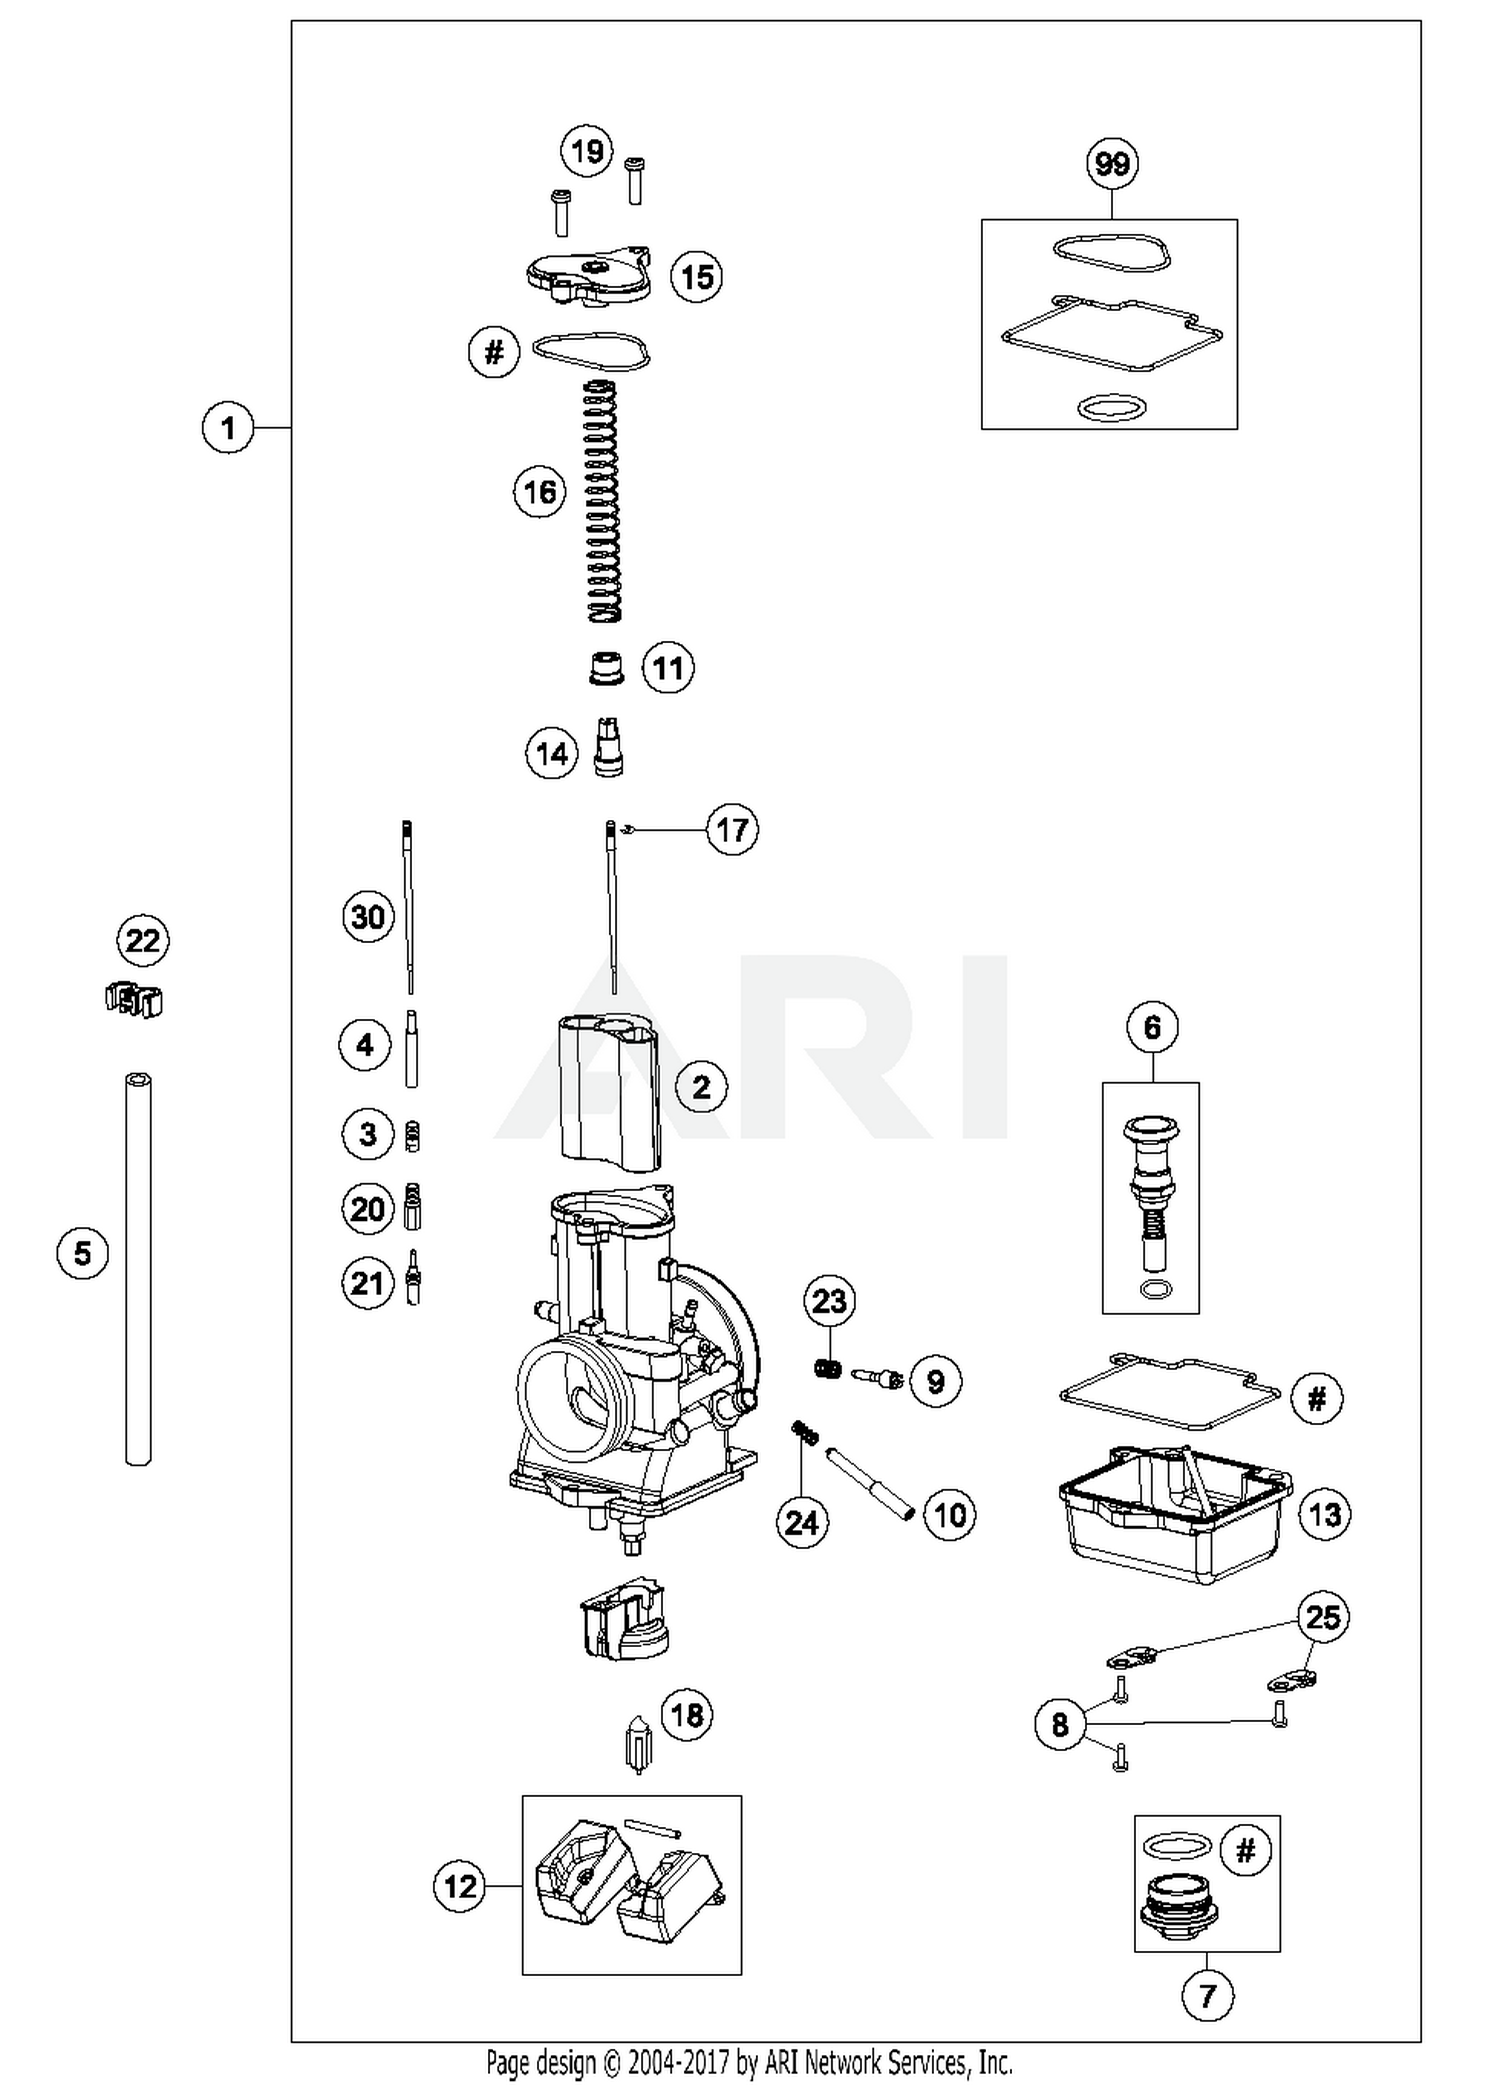 ktm 525 wiring diagram